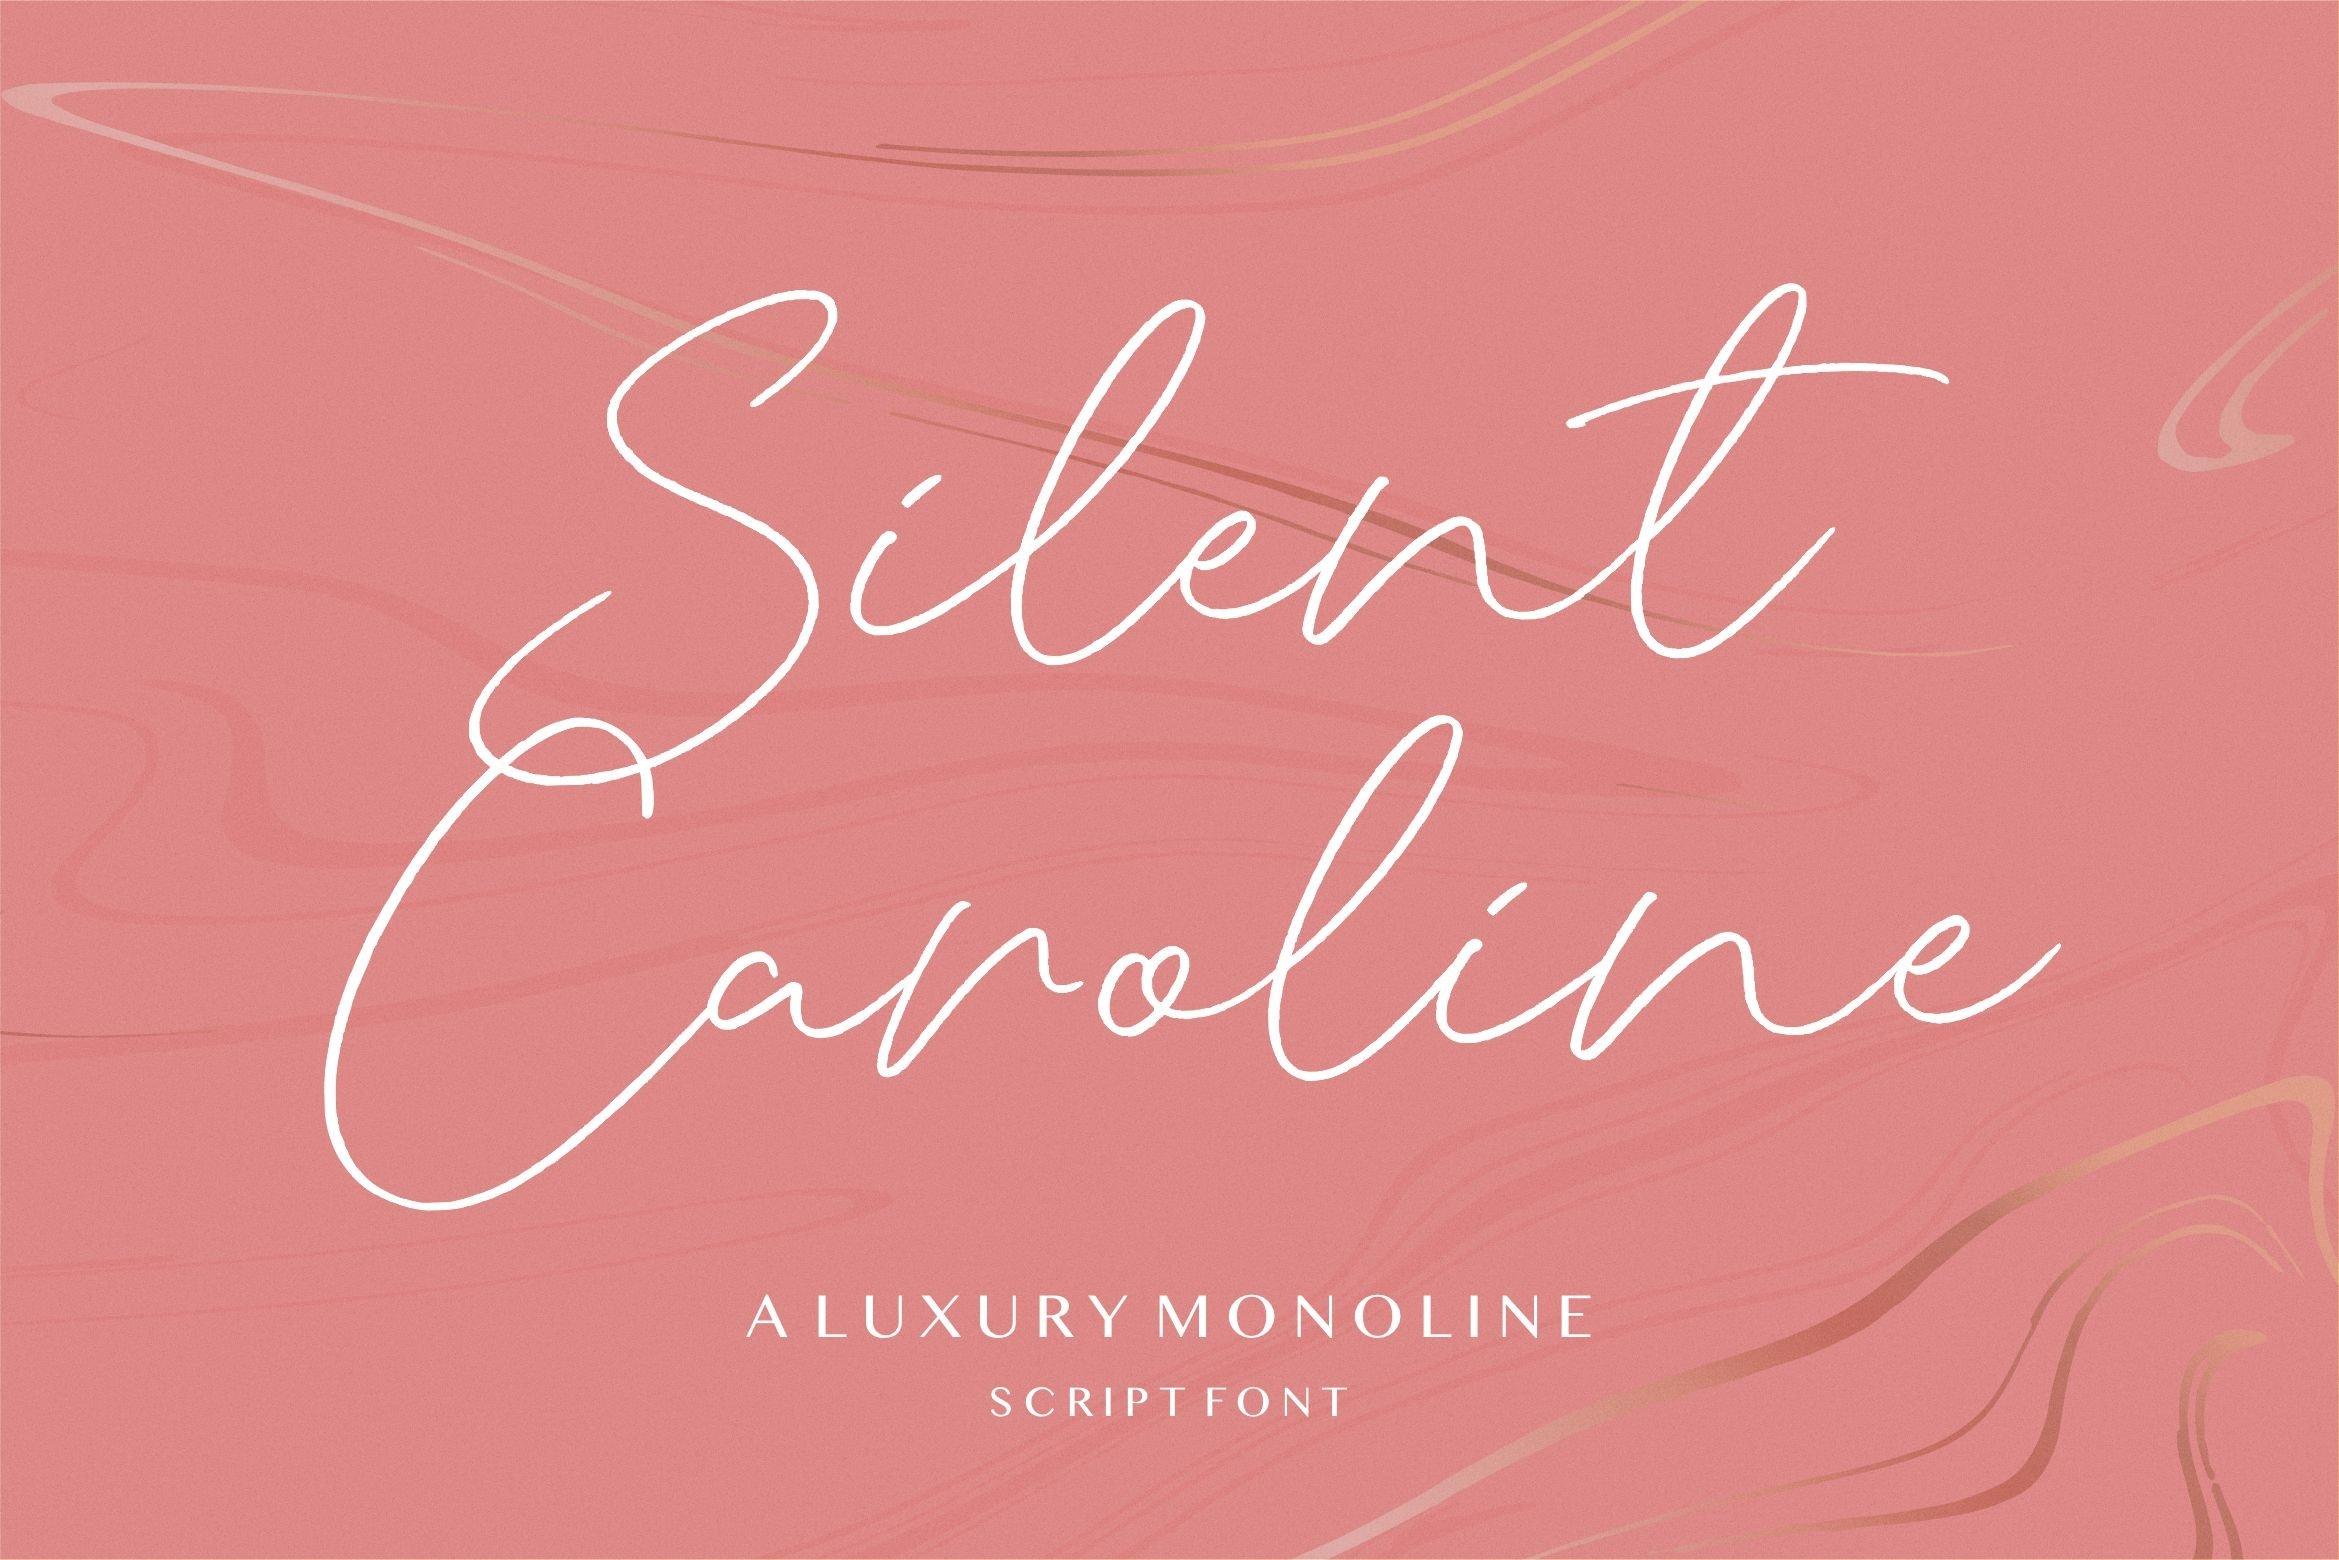 Silent Caroline Luxury Script Font -1